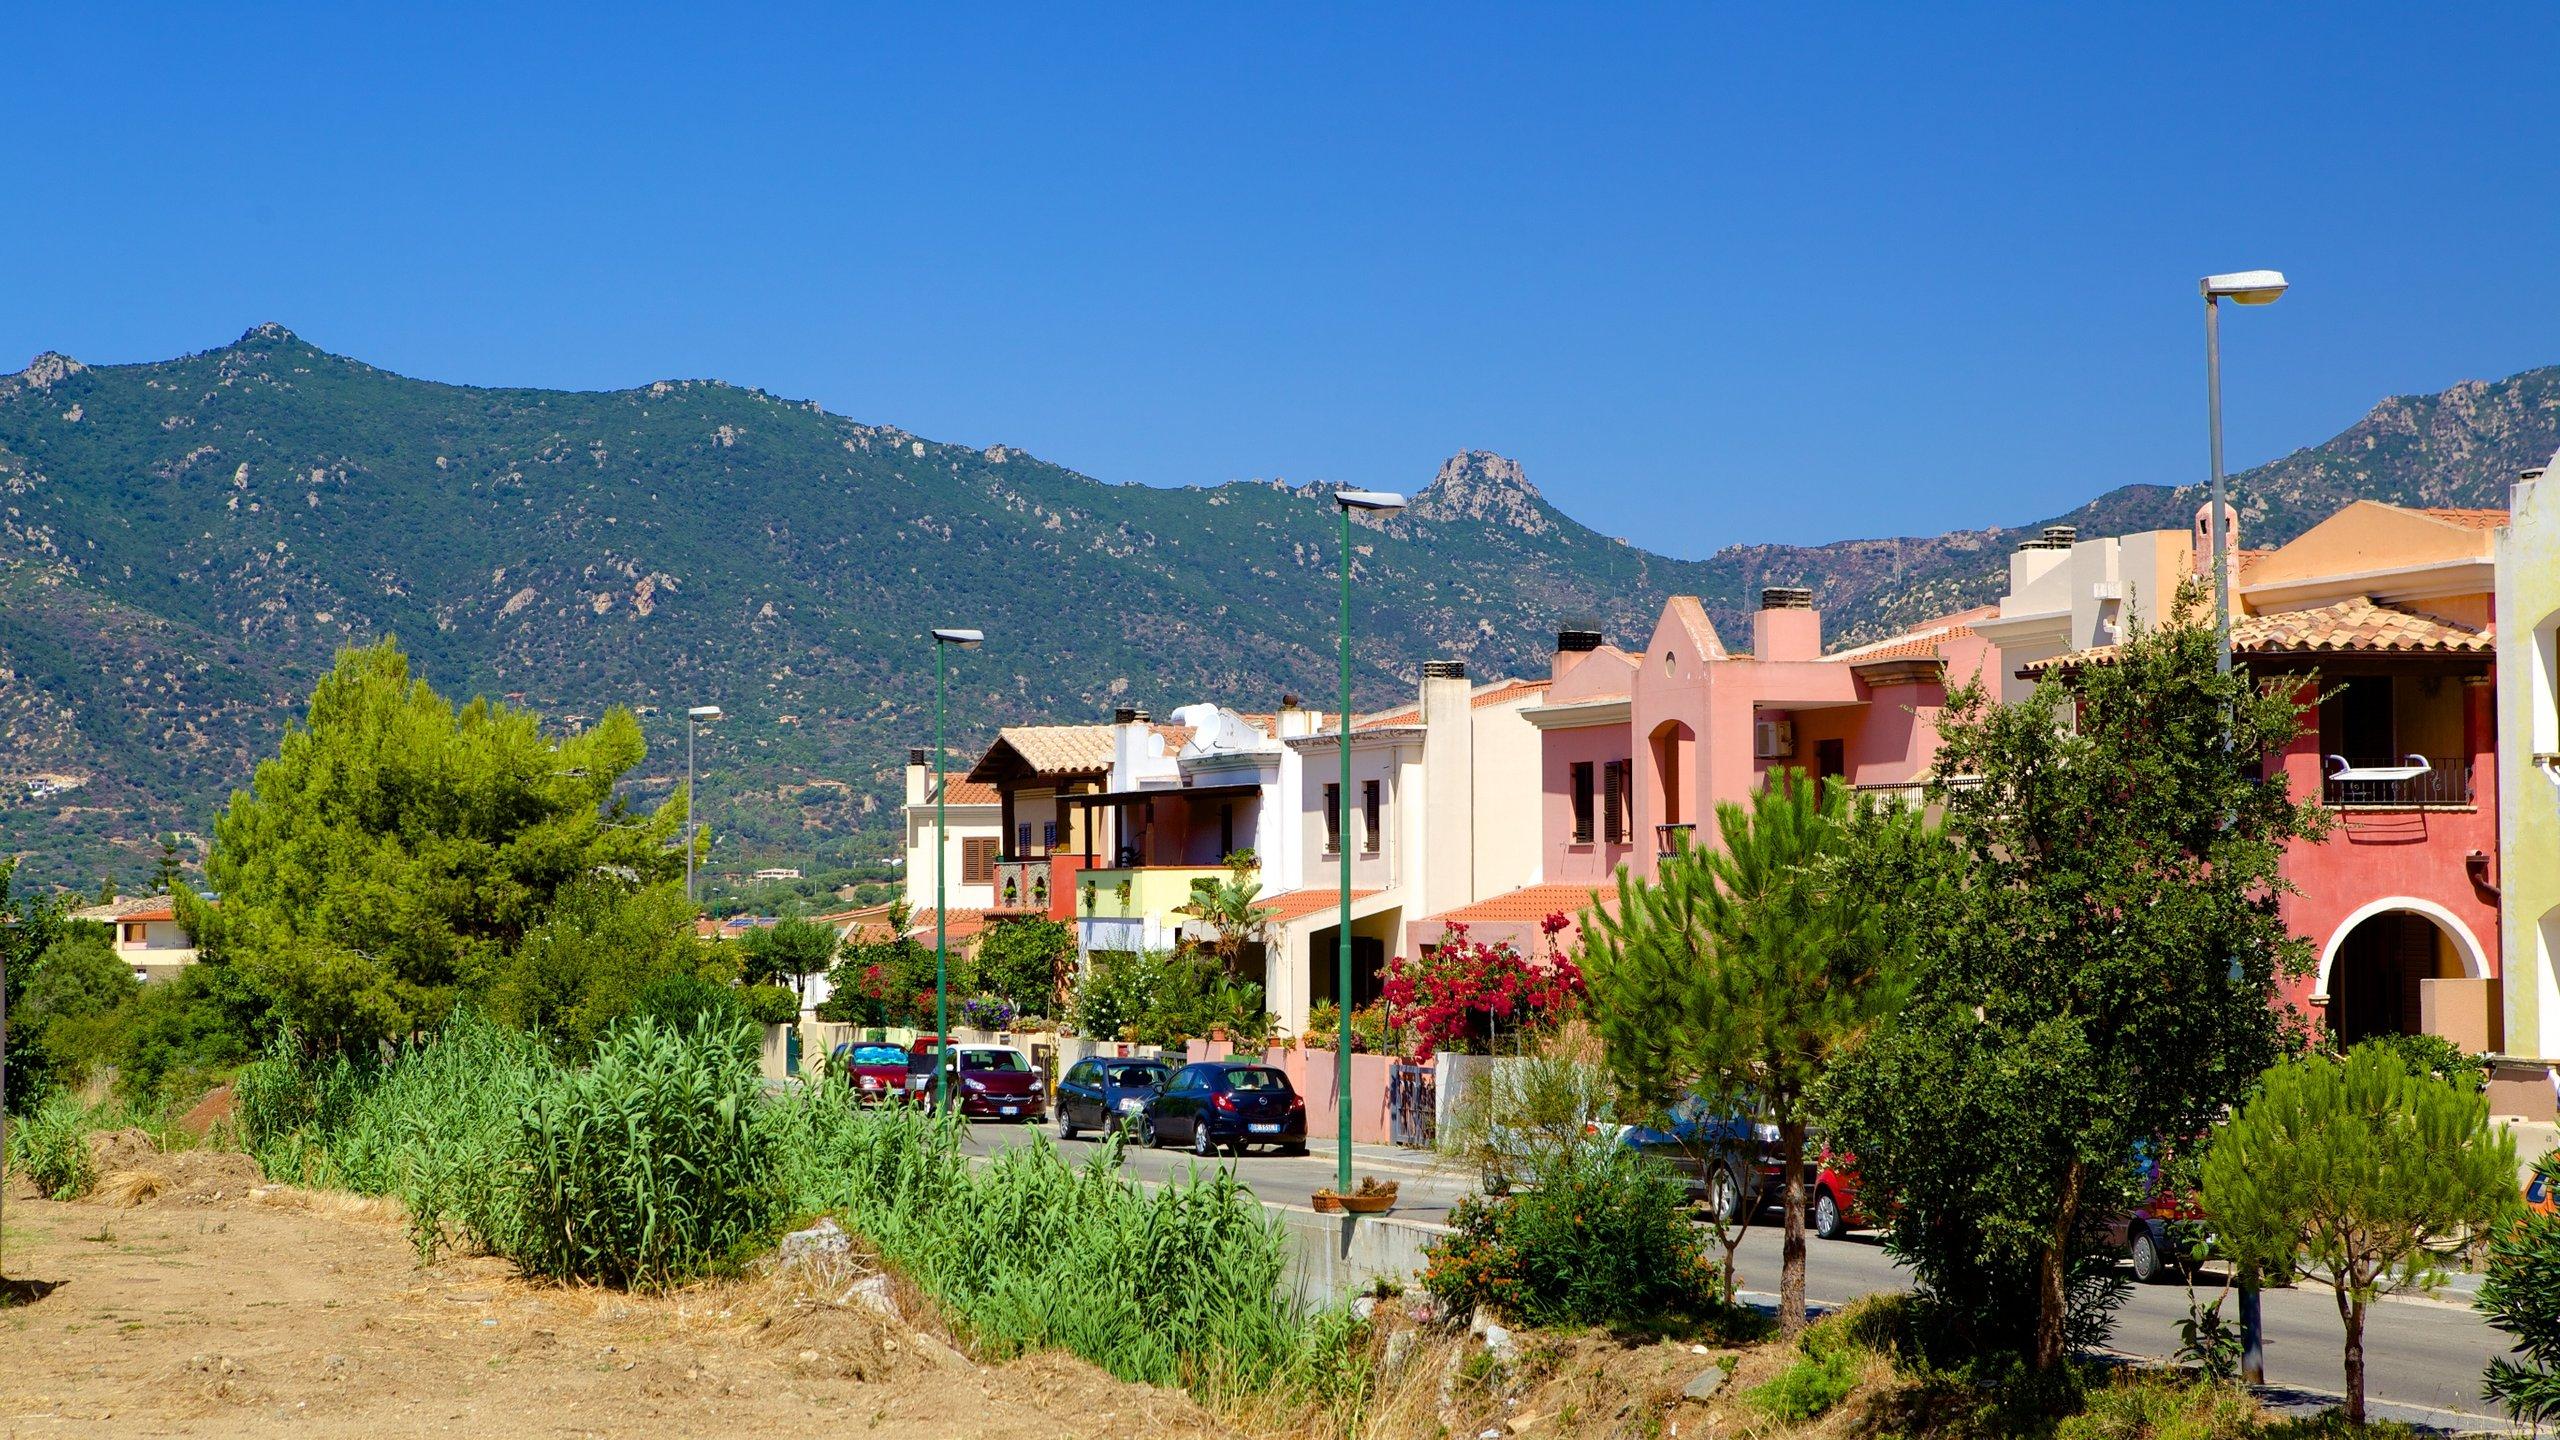 Cagliari - Villasimius - Southern Sardinia Hotels from $58 ...